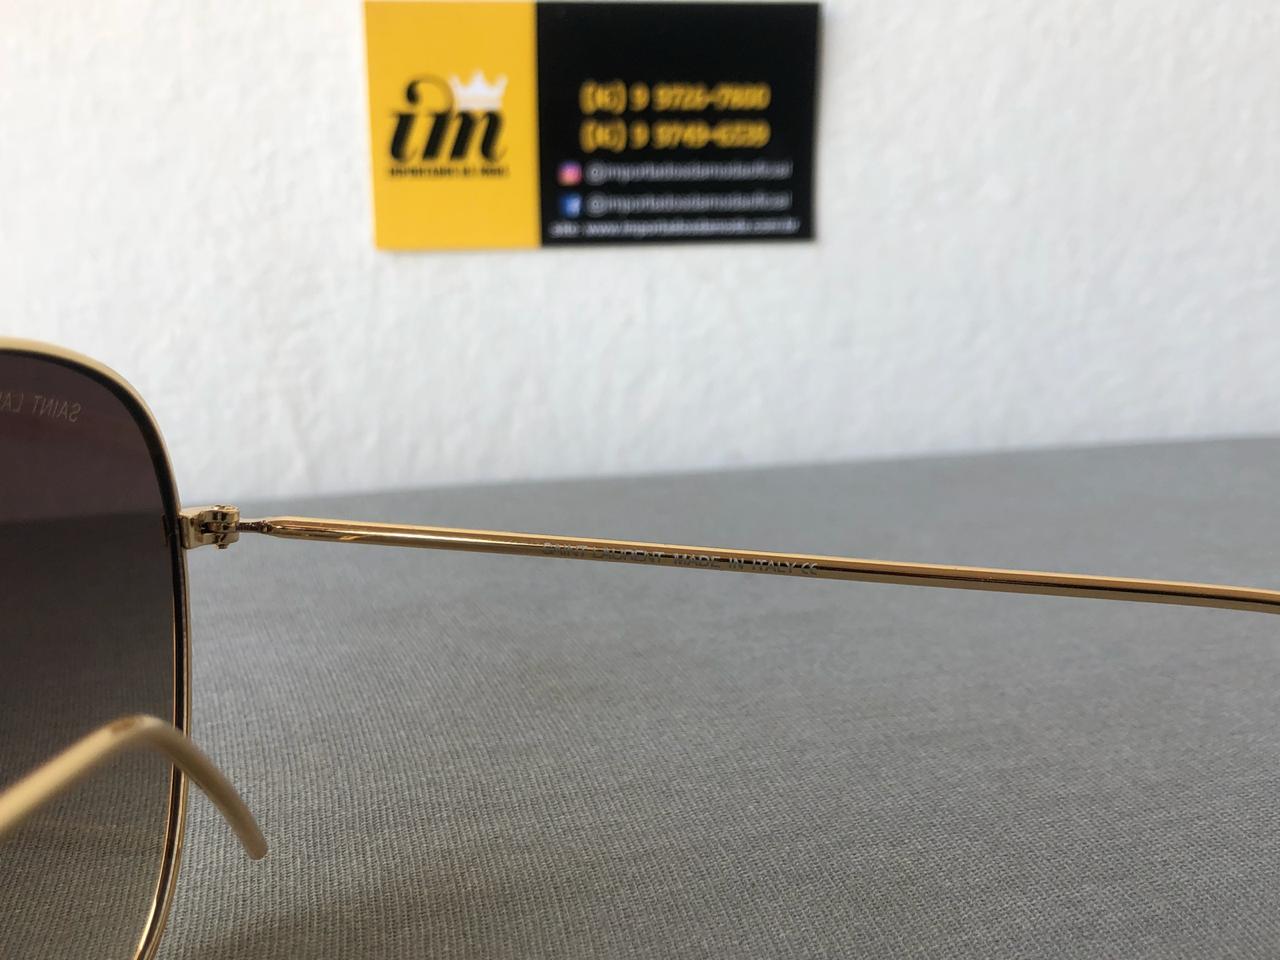 Oculos de Sol Saint Laurent Replica Primeira Linha 3